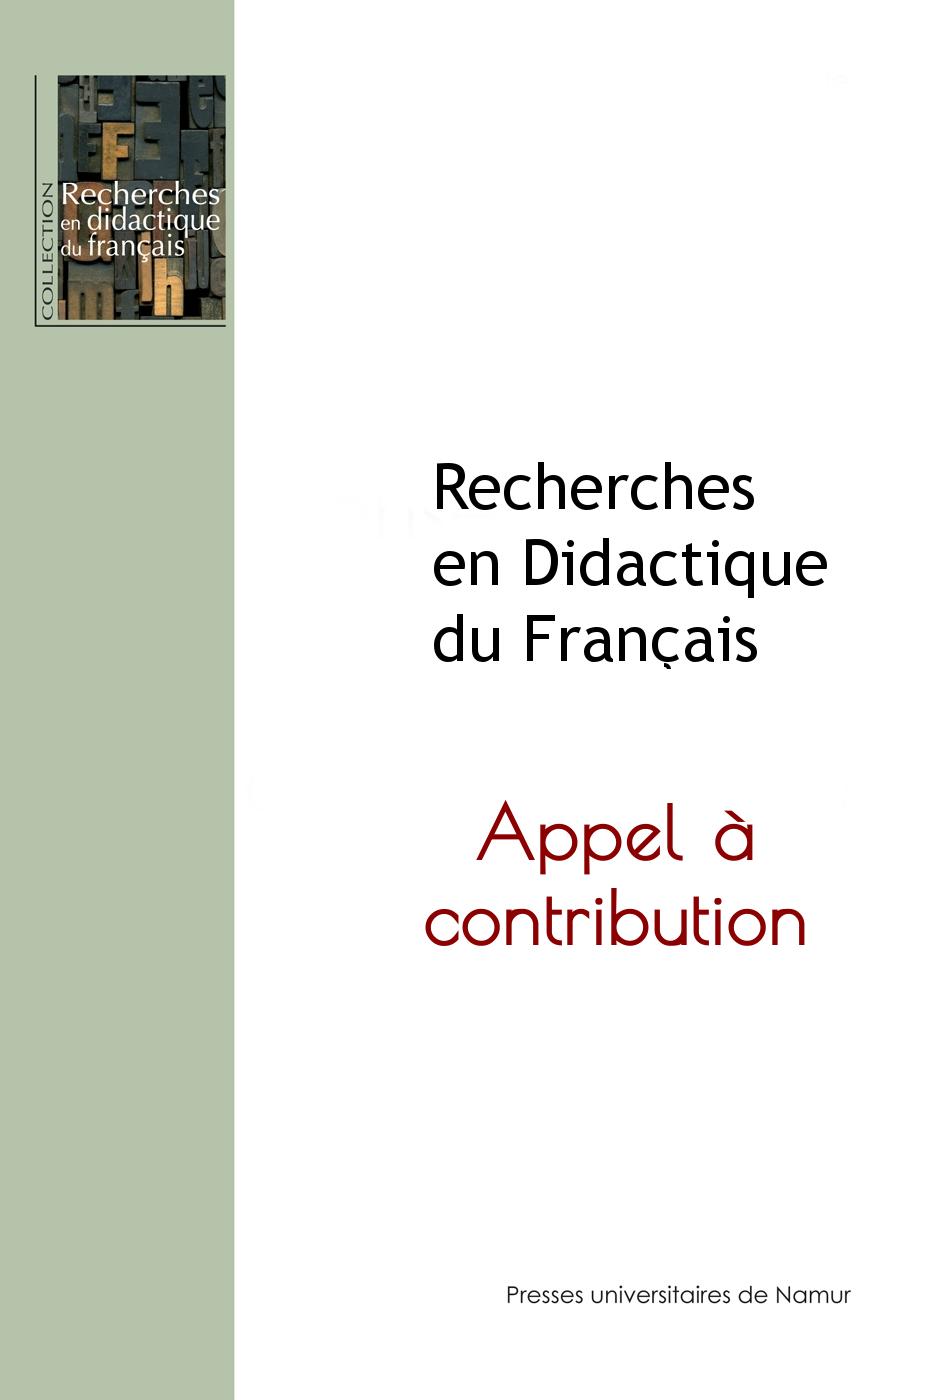 RDF contrib